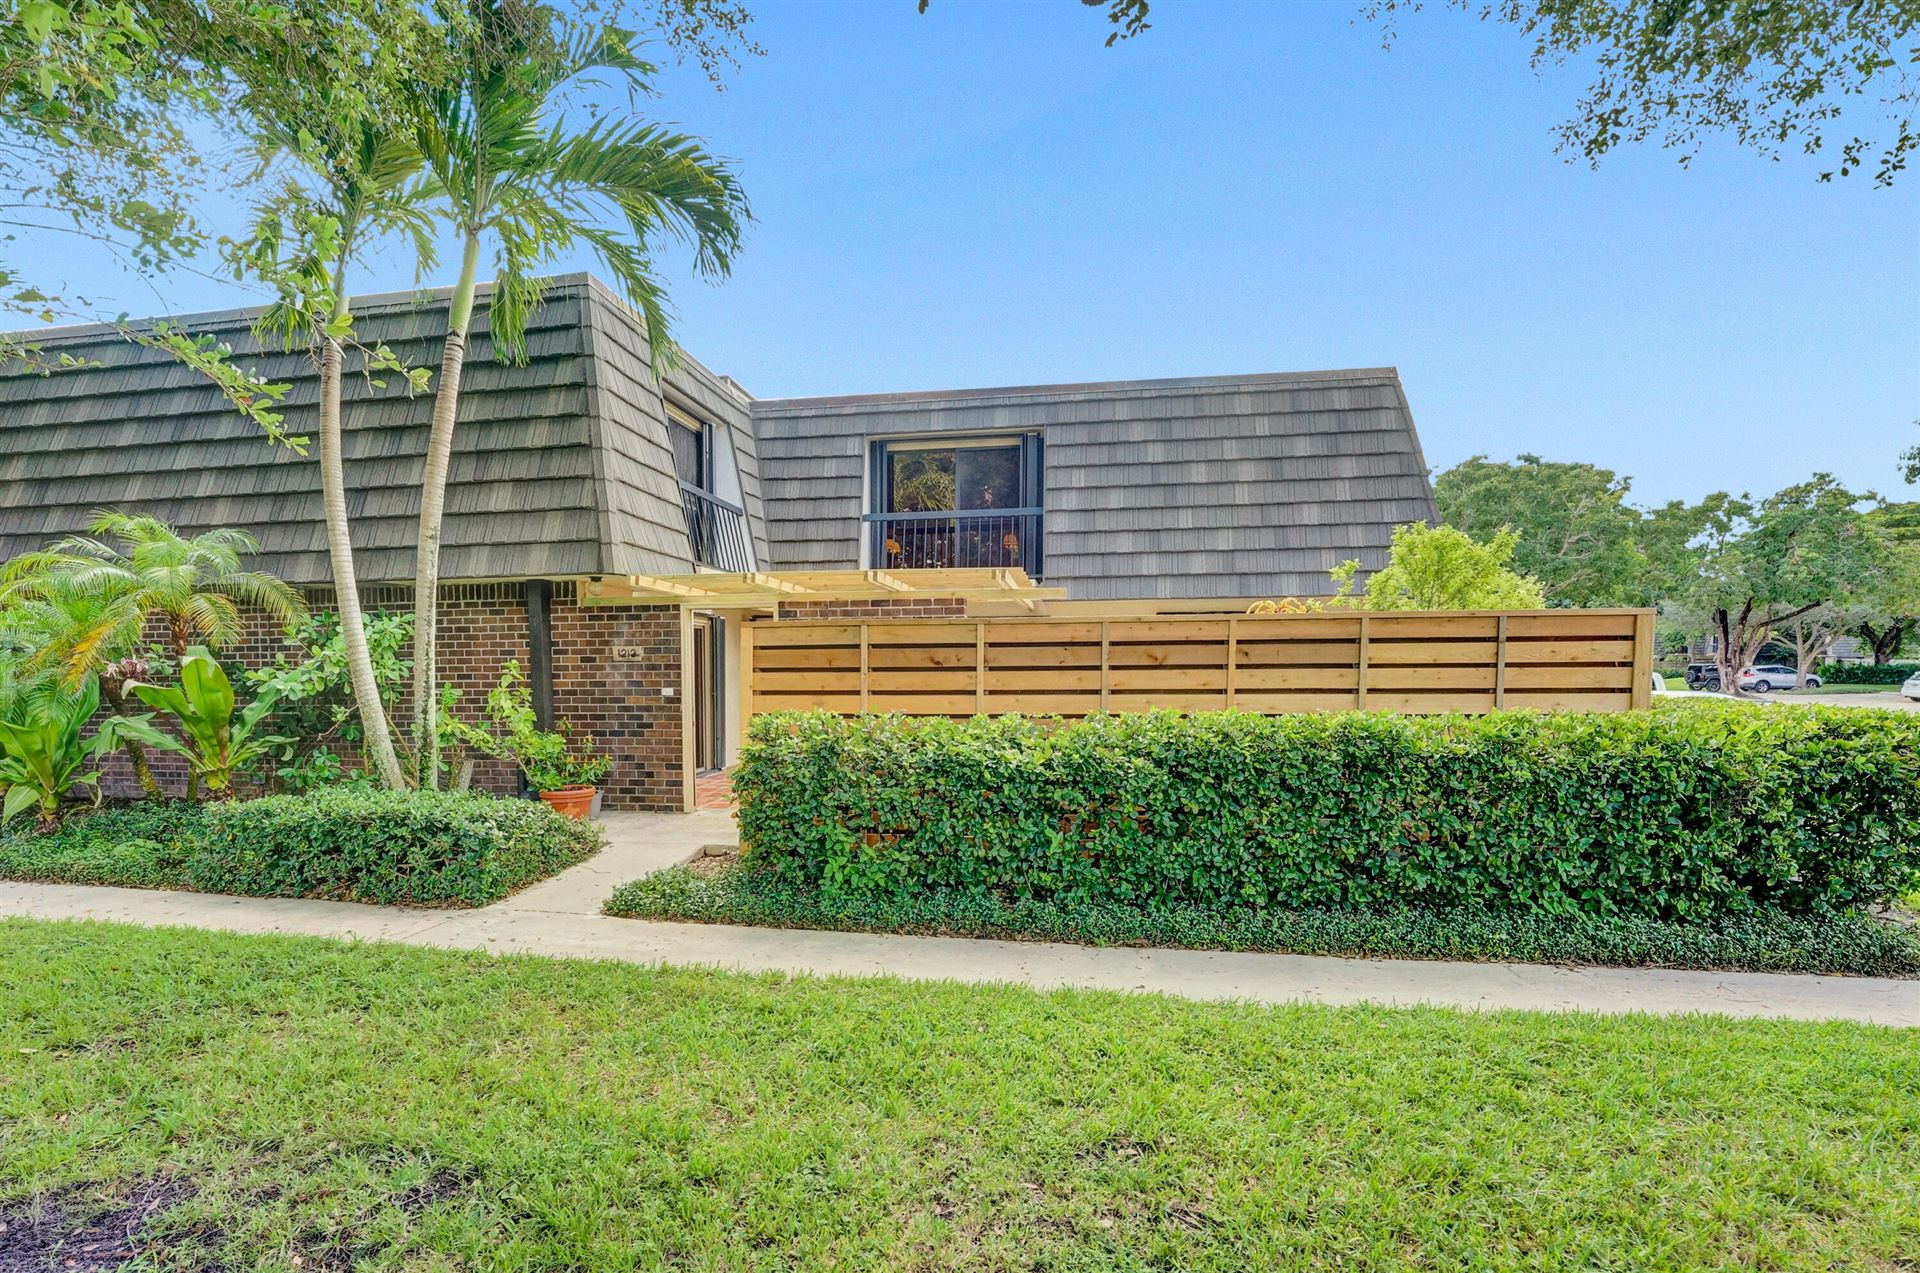 Photo of 1213 12th Terrace, Palm Beach Gardens, FL 33418 (MLS # RX-10746489)